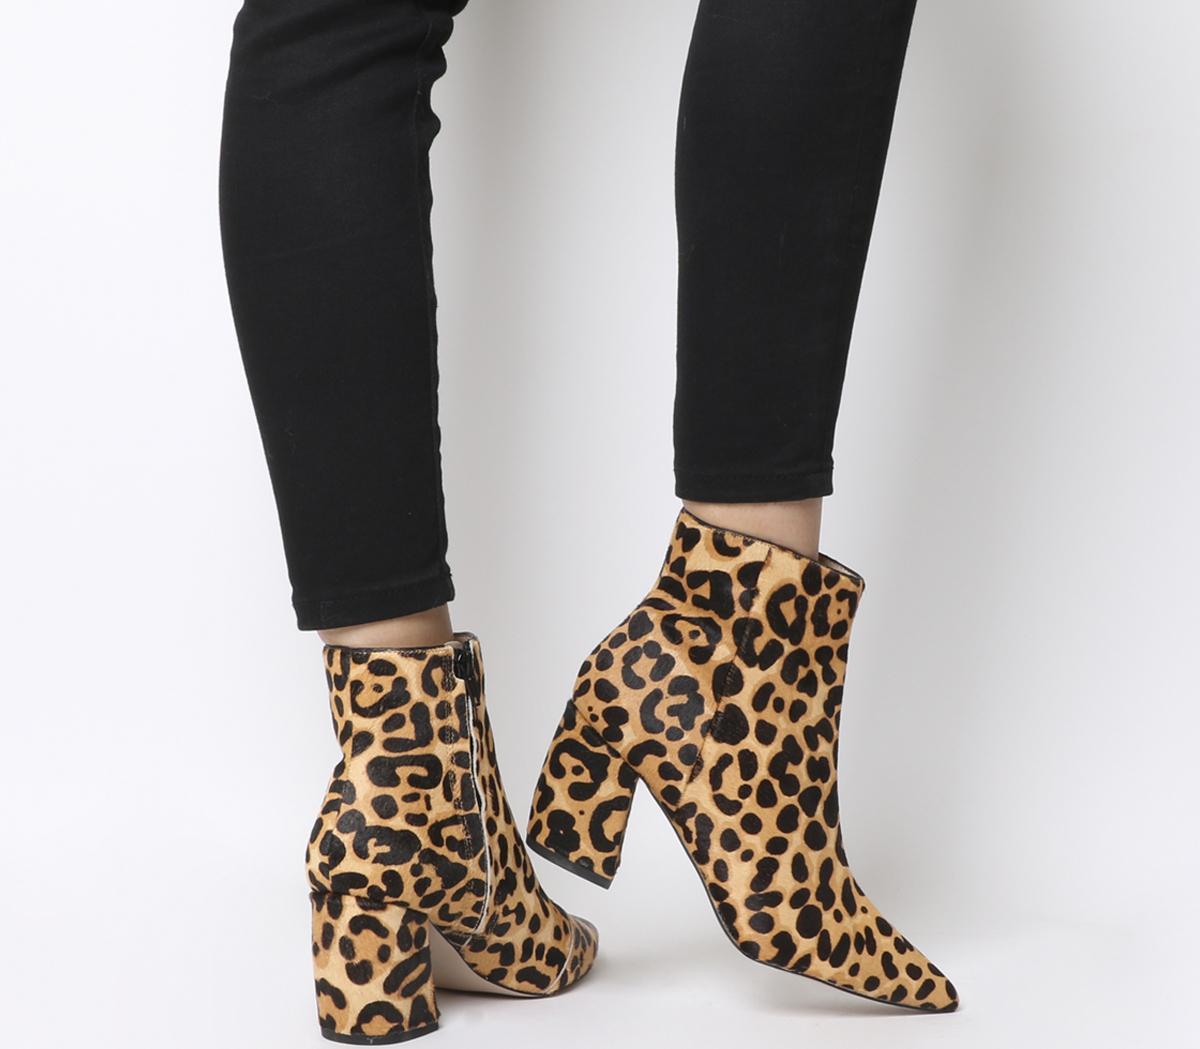 Aloud Point Block Heel Boots Leopard Cow Hair Effect